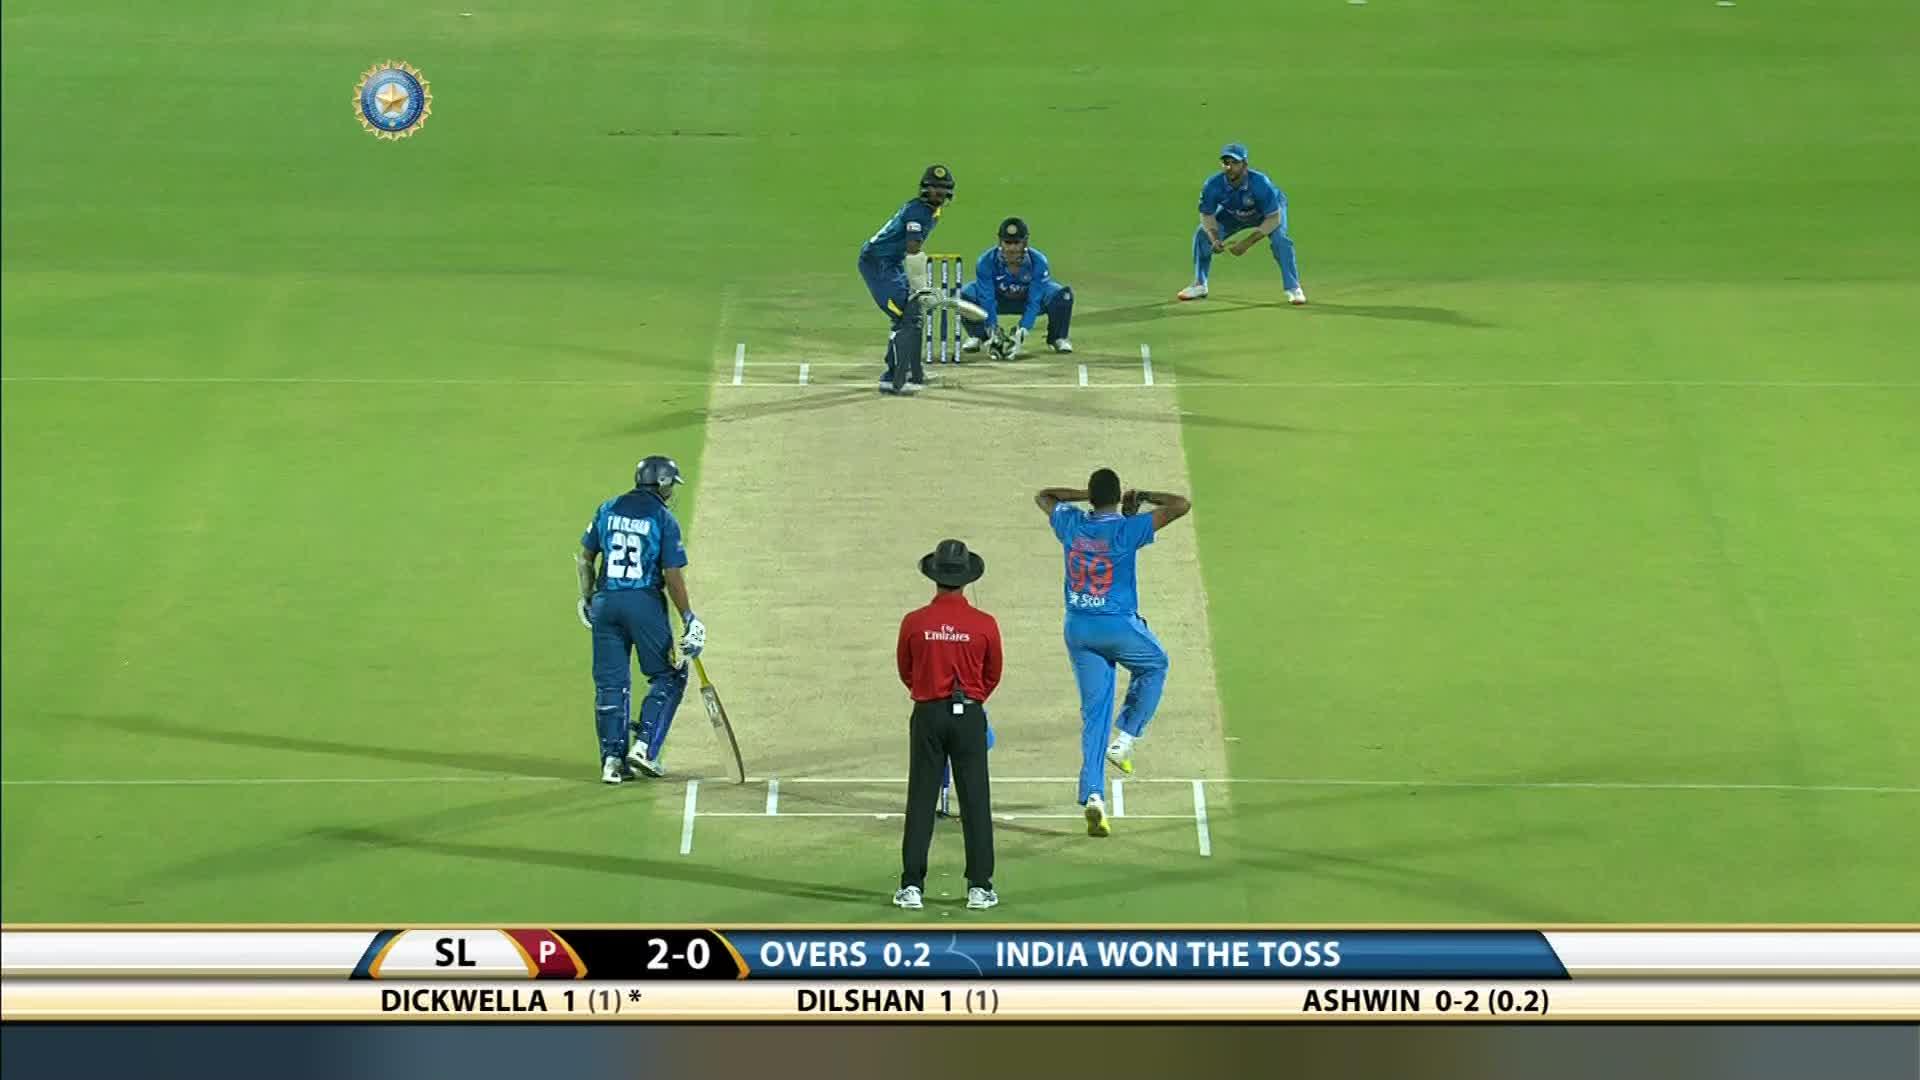 India vs Ireland 2nd T20 live cricket streaming on Sony Liv and Sky Sports